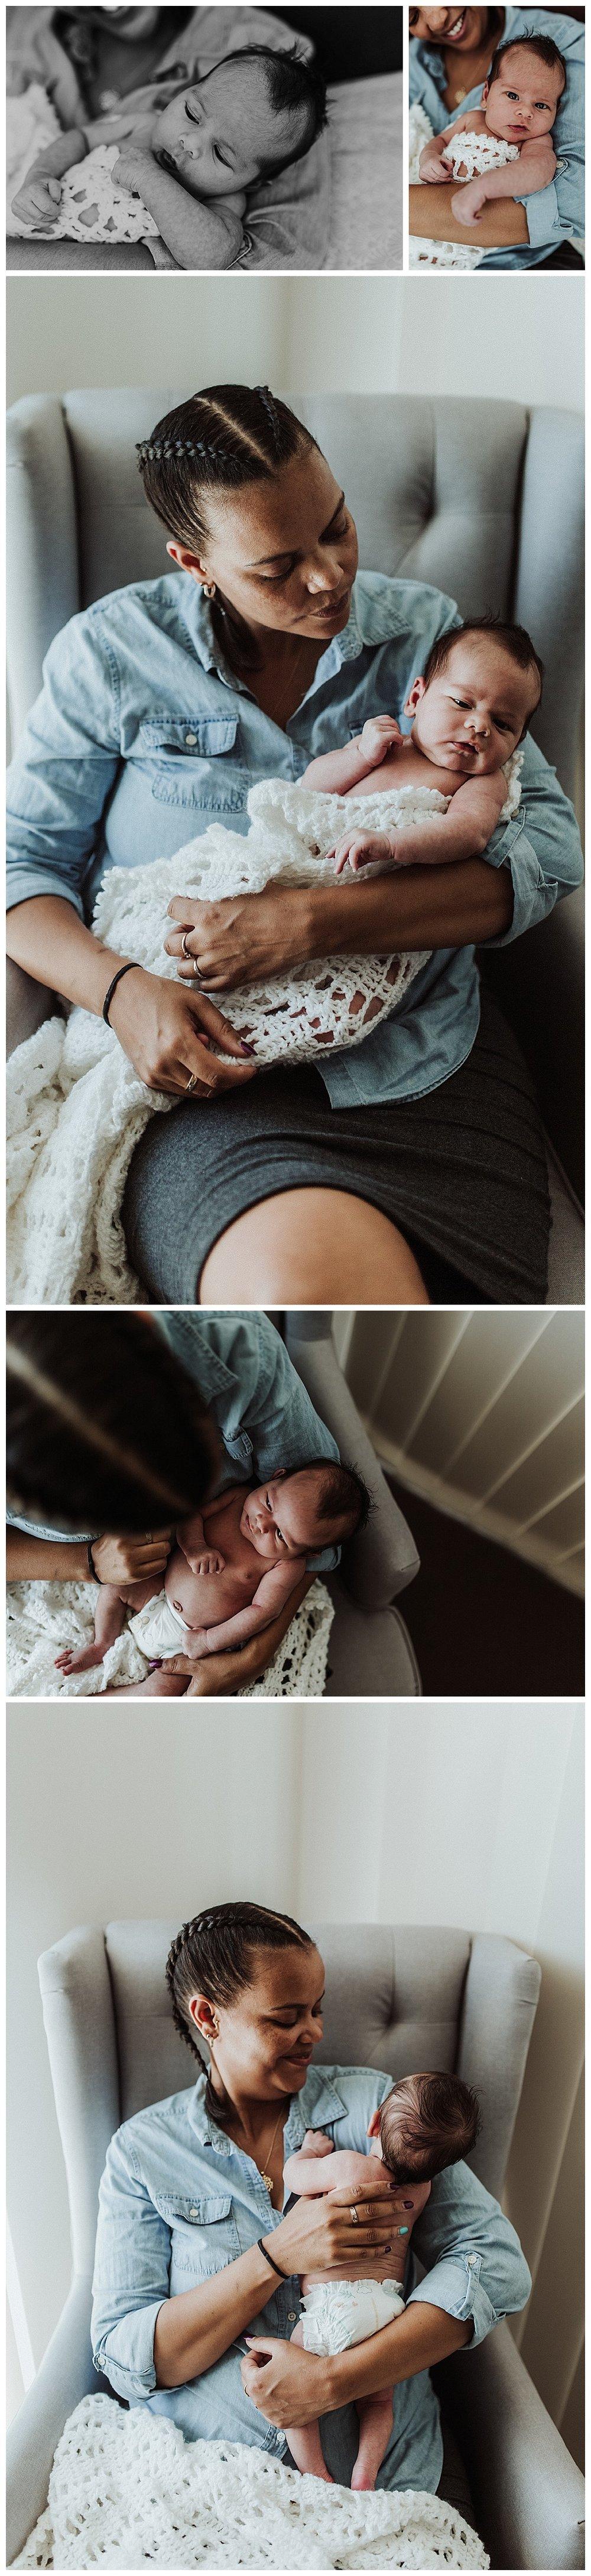 New mum newborn baby postpartum photographer Townsville